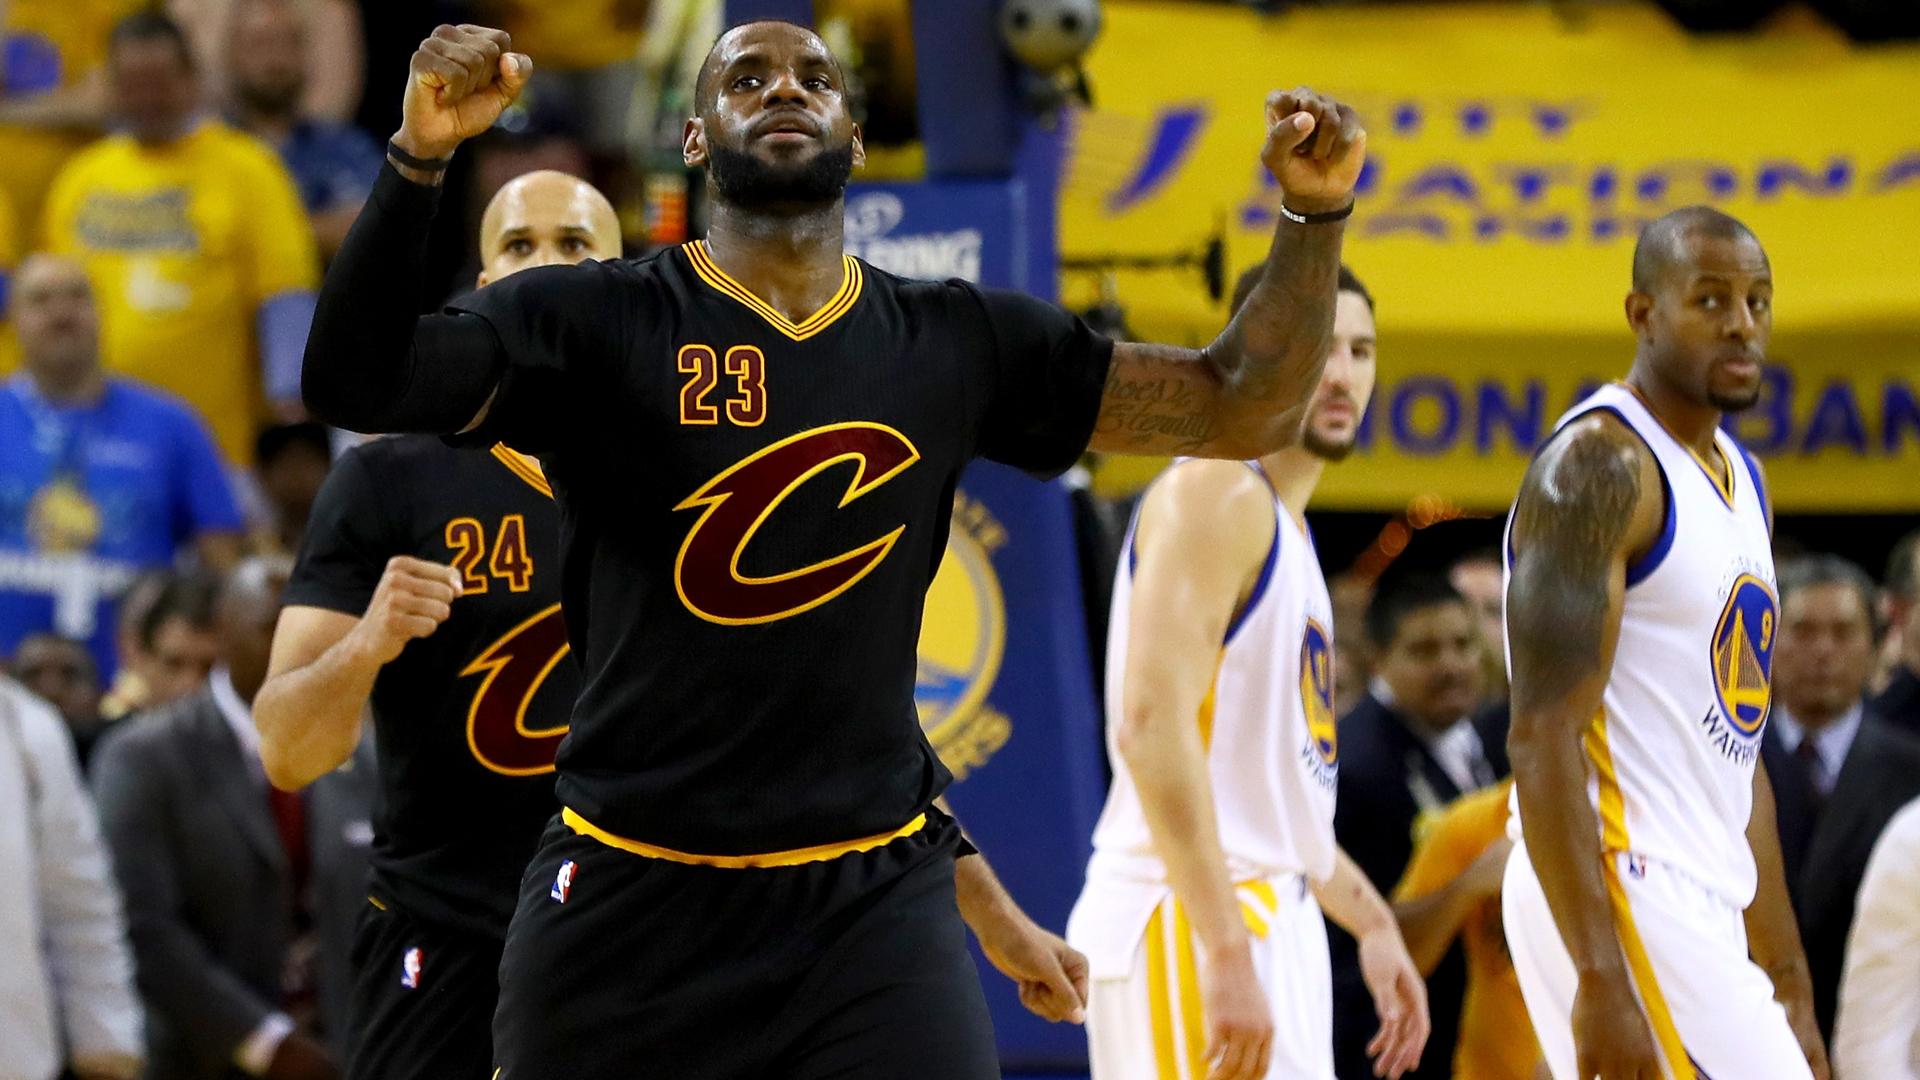 Cavaliers vs warriors game 7 predictions - Cavaliers Vs Warriors Game 7 Predictions 10